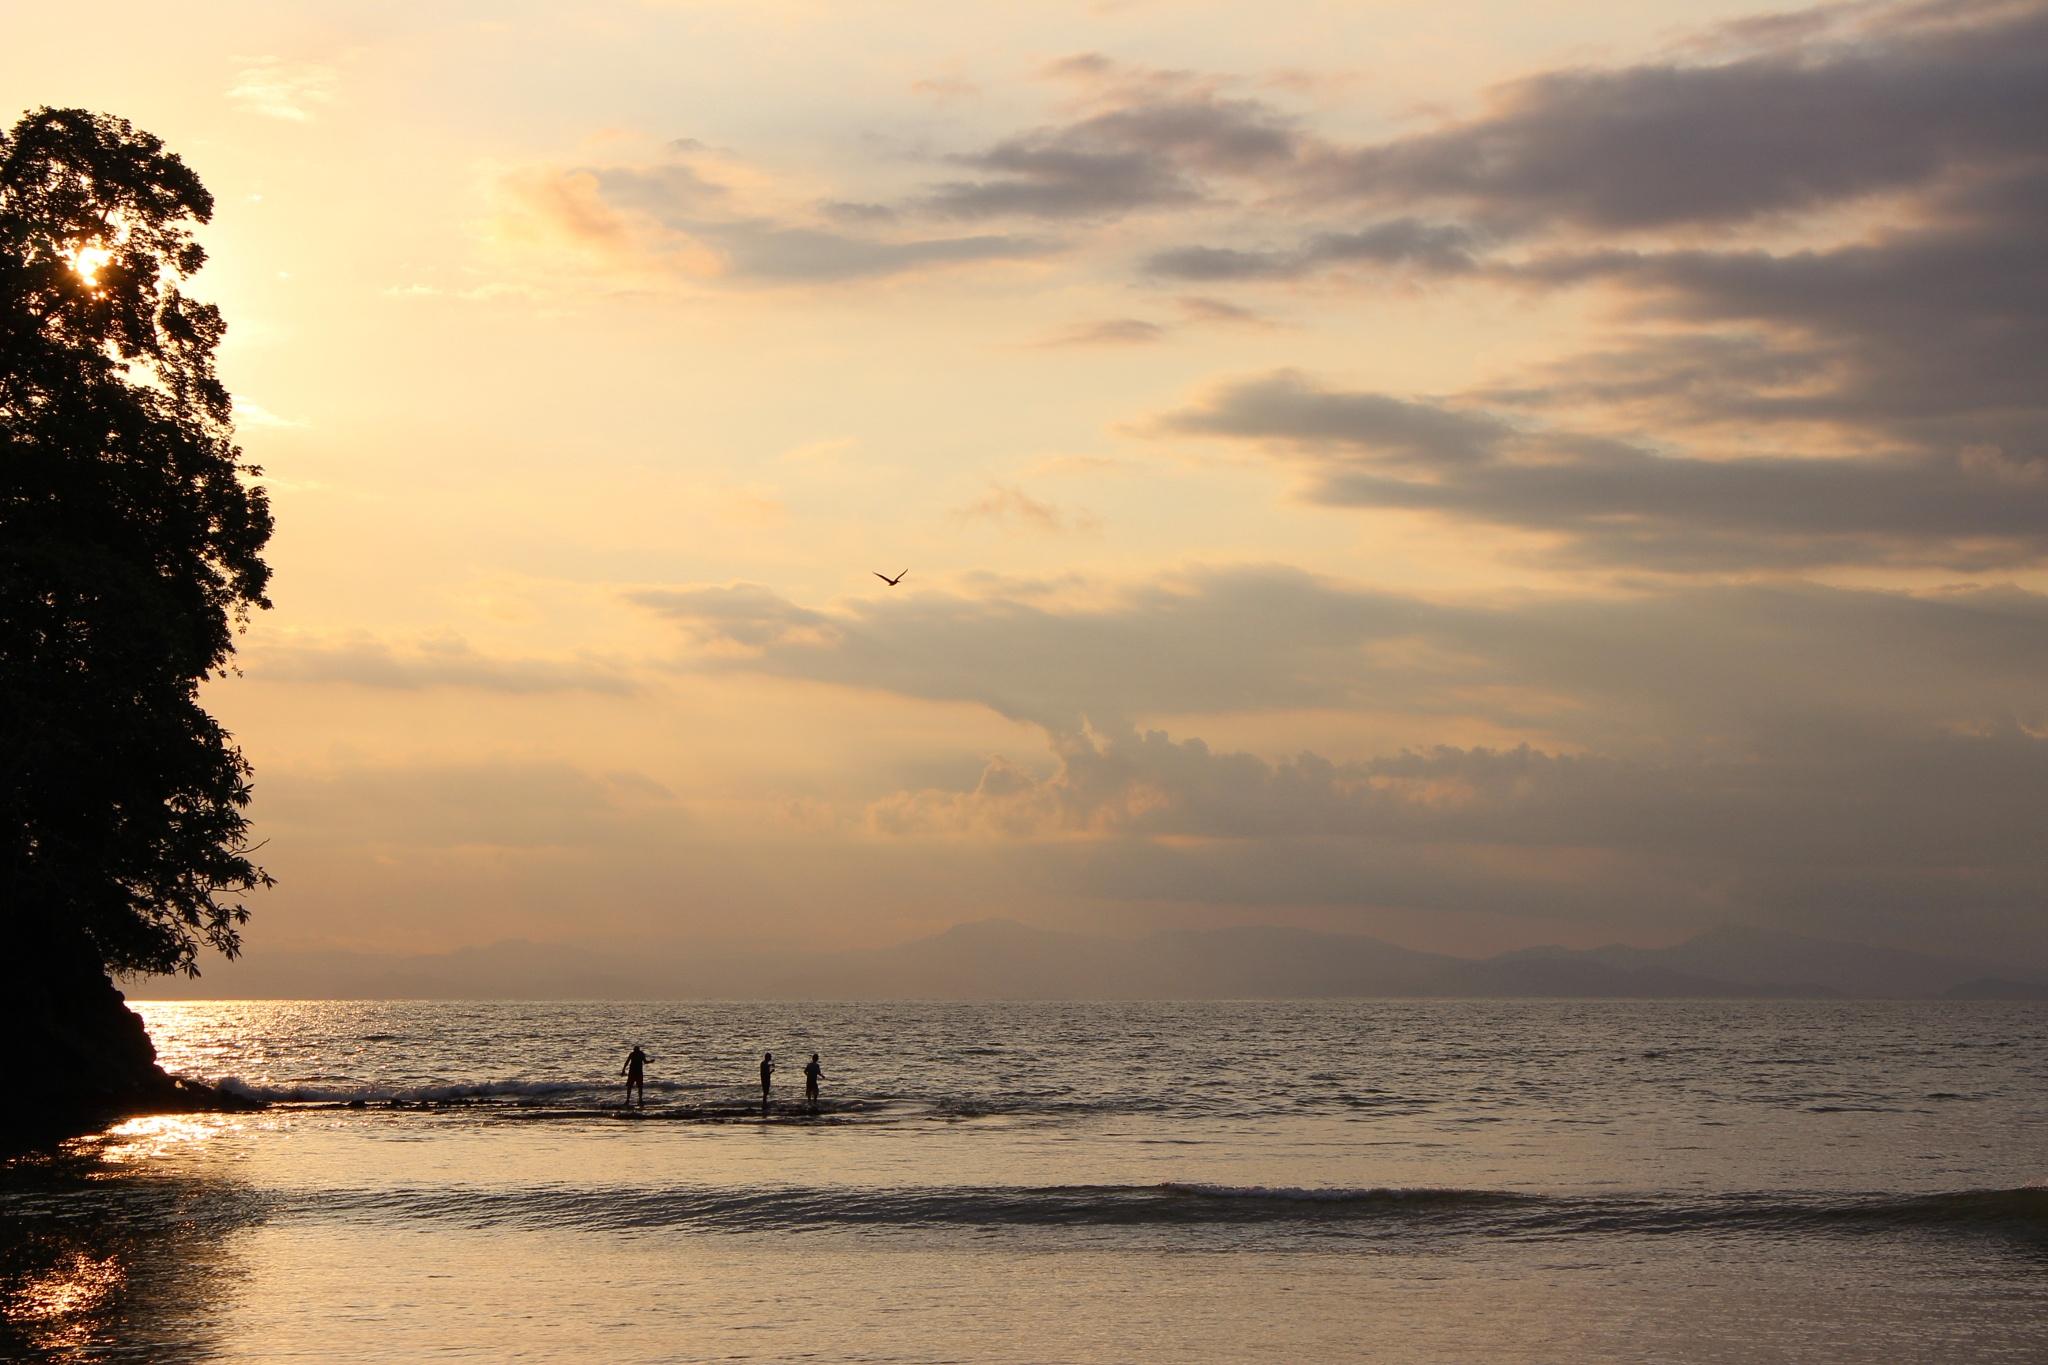 Last ray of light in the Pacific  by Benedito Luiz Arruda